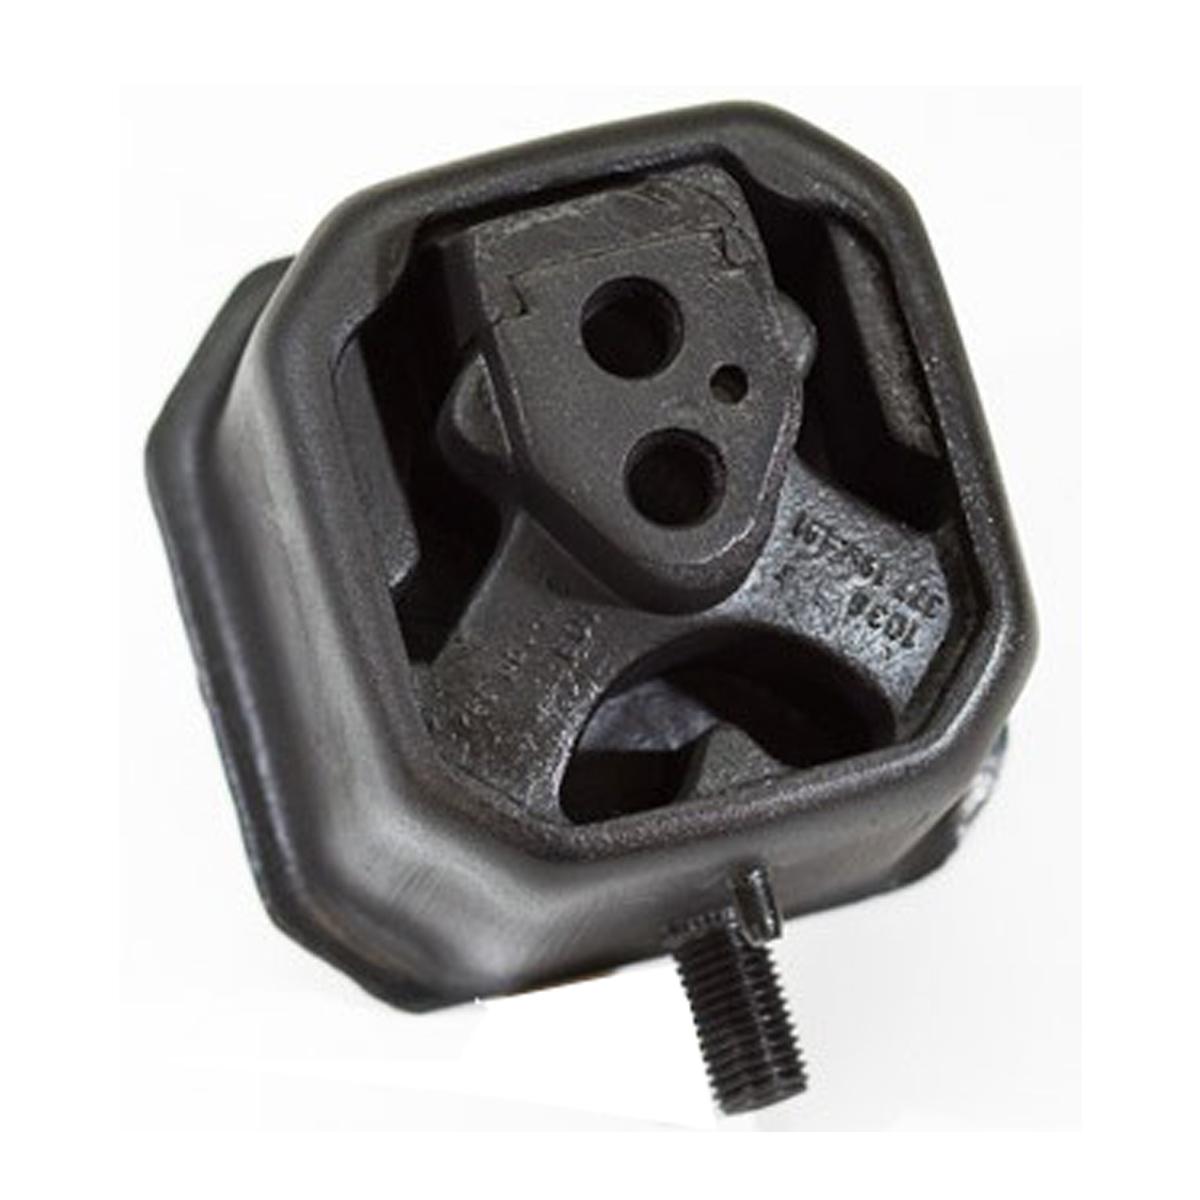 Coxim LD Motor AT Gol / Parati 1.0 - W 1037 Expedibor